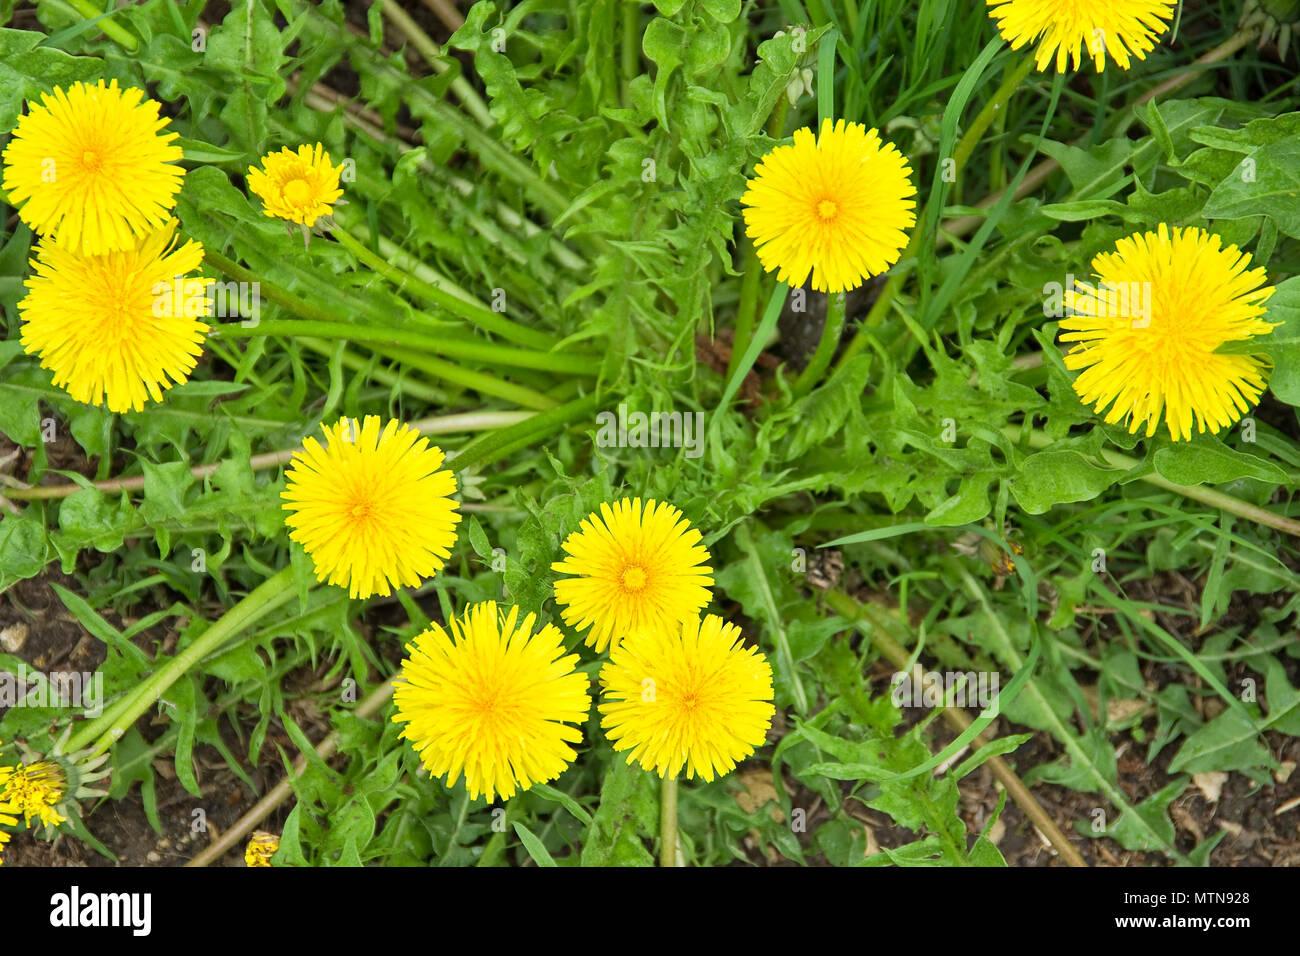 Blühenden Löwenzahn, Taraxacum officinale. Stockbild